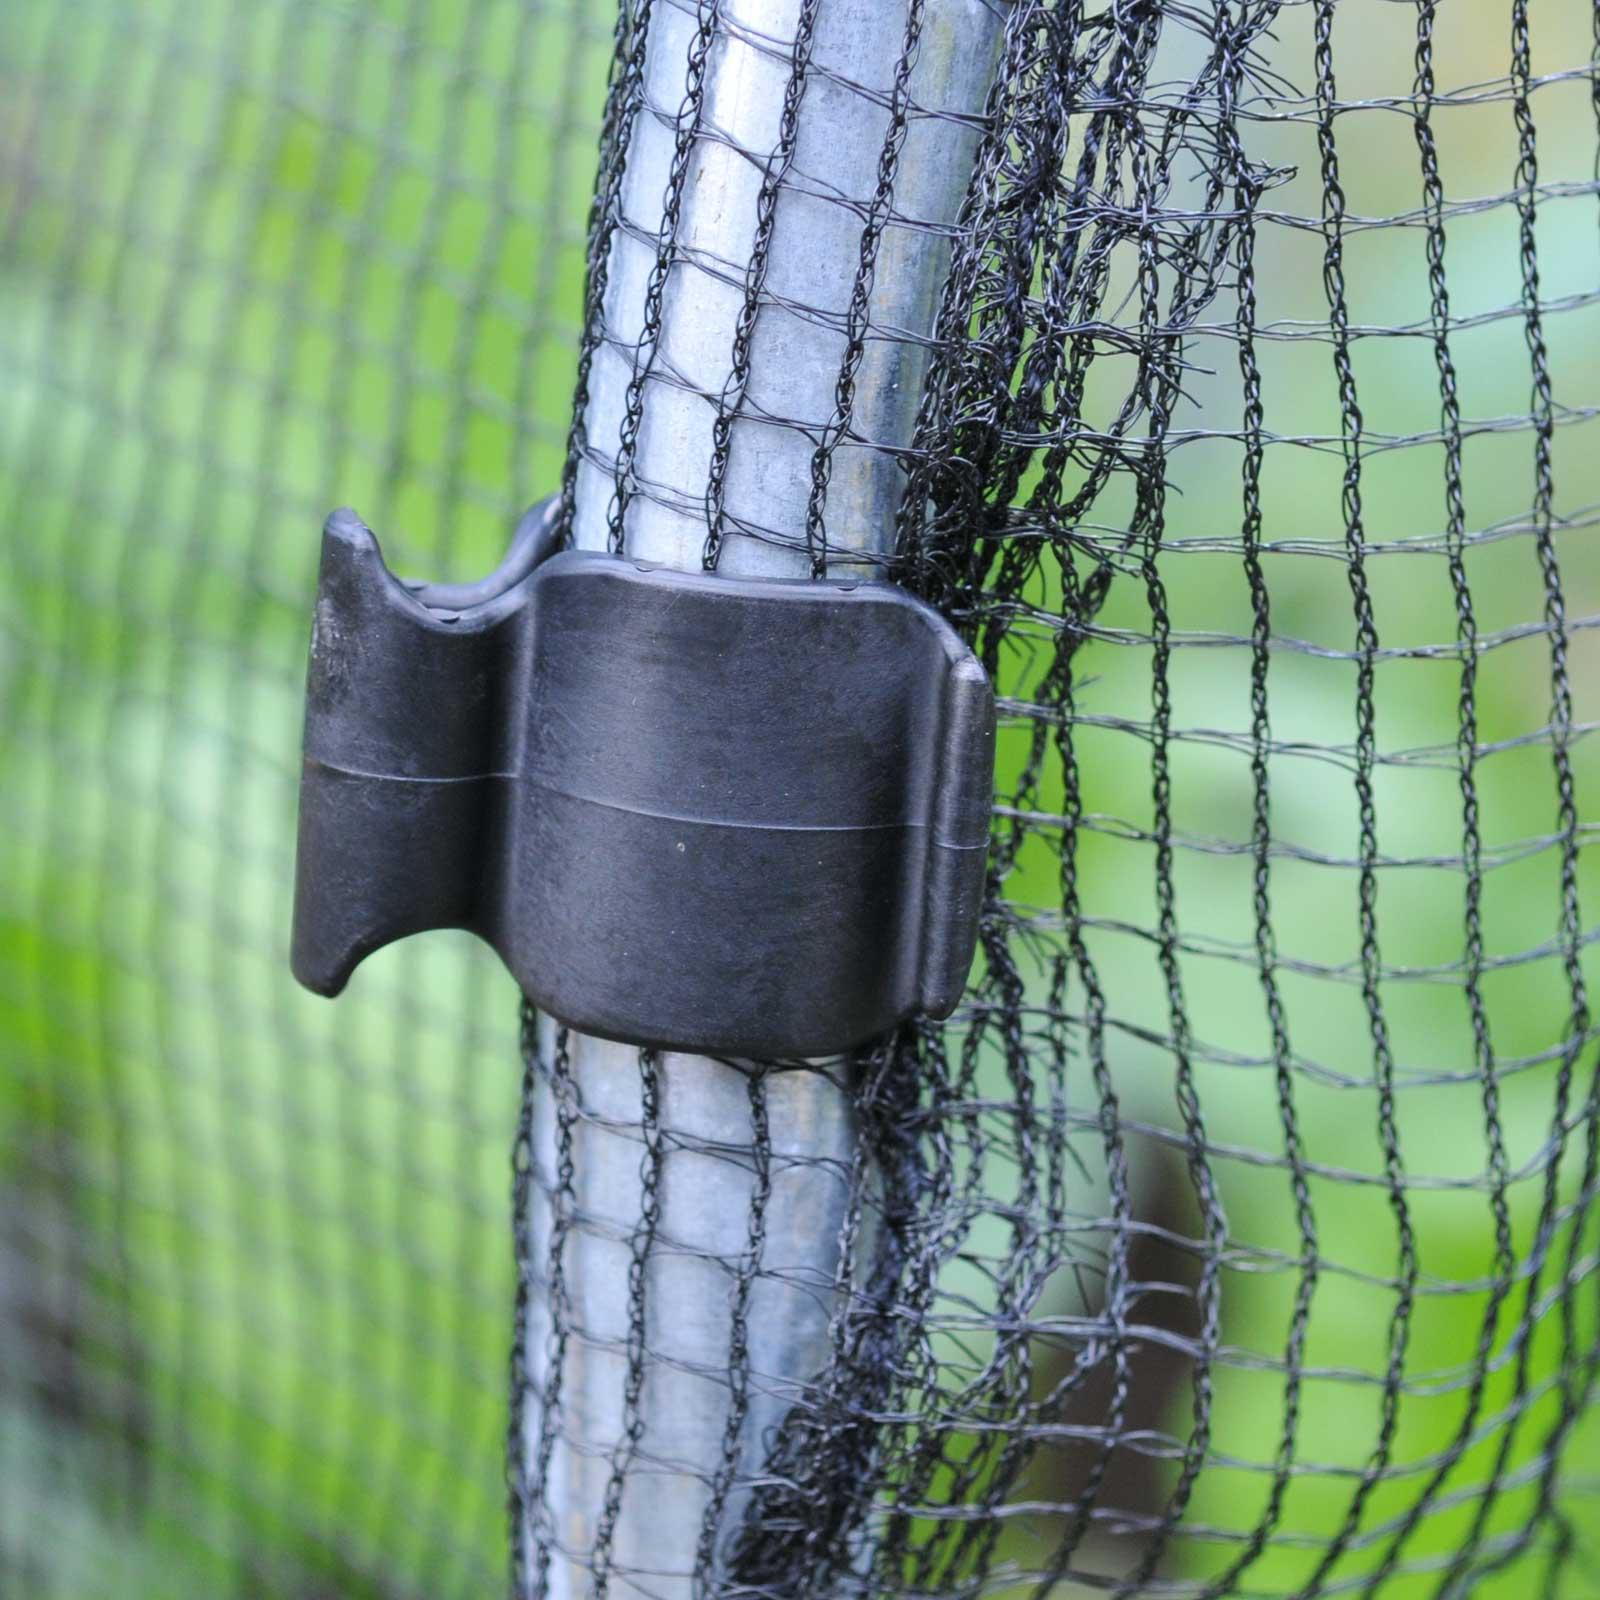 Plants & Plant Care 19mm Plastic Hoop Clips (10 Pack)